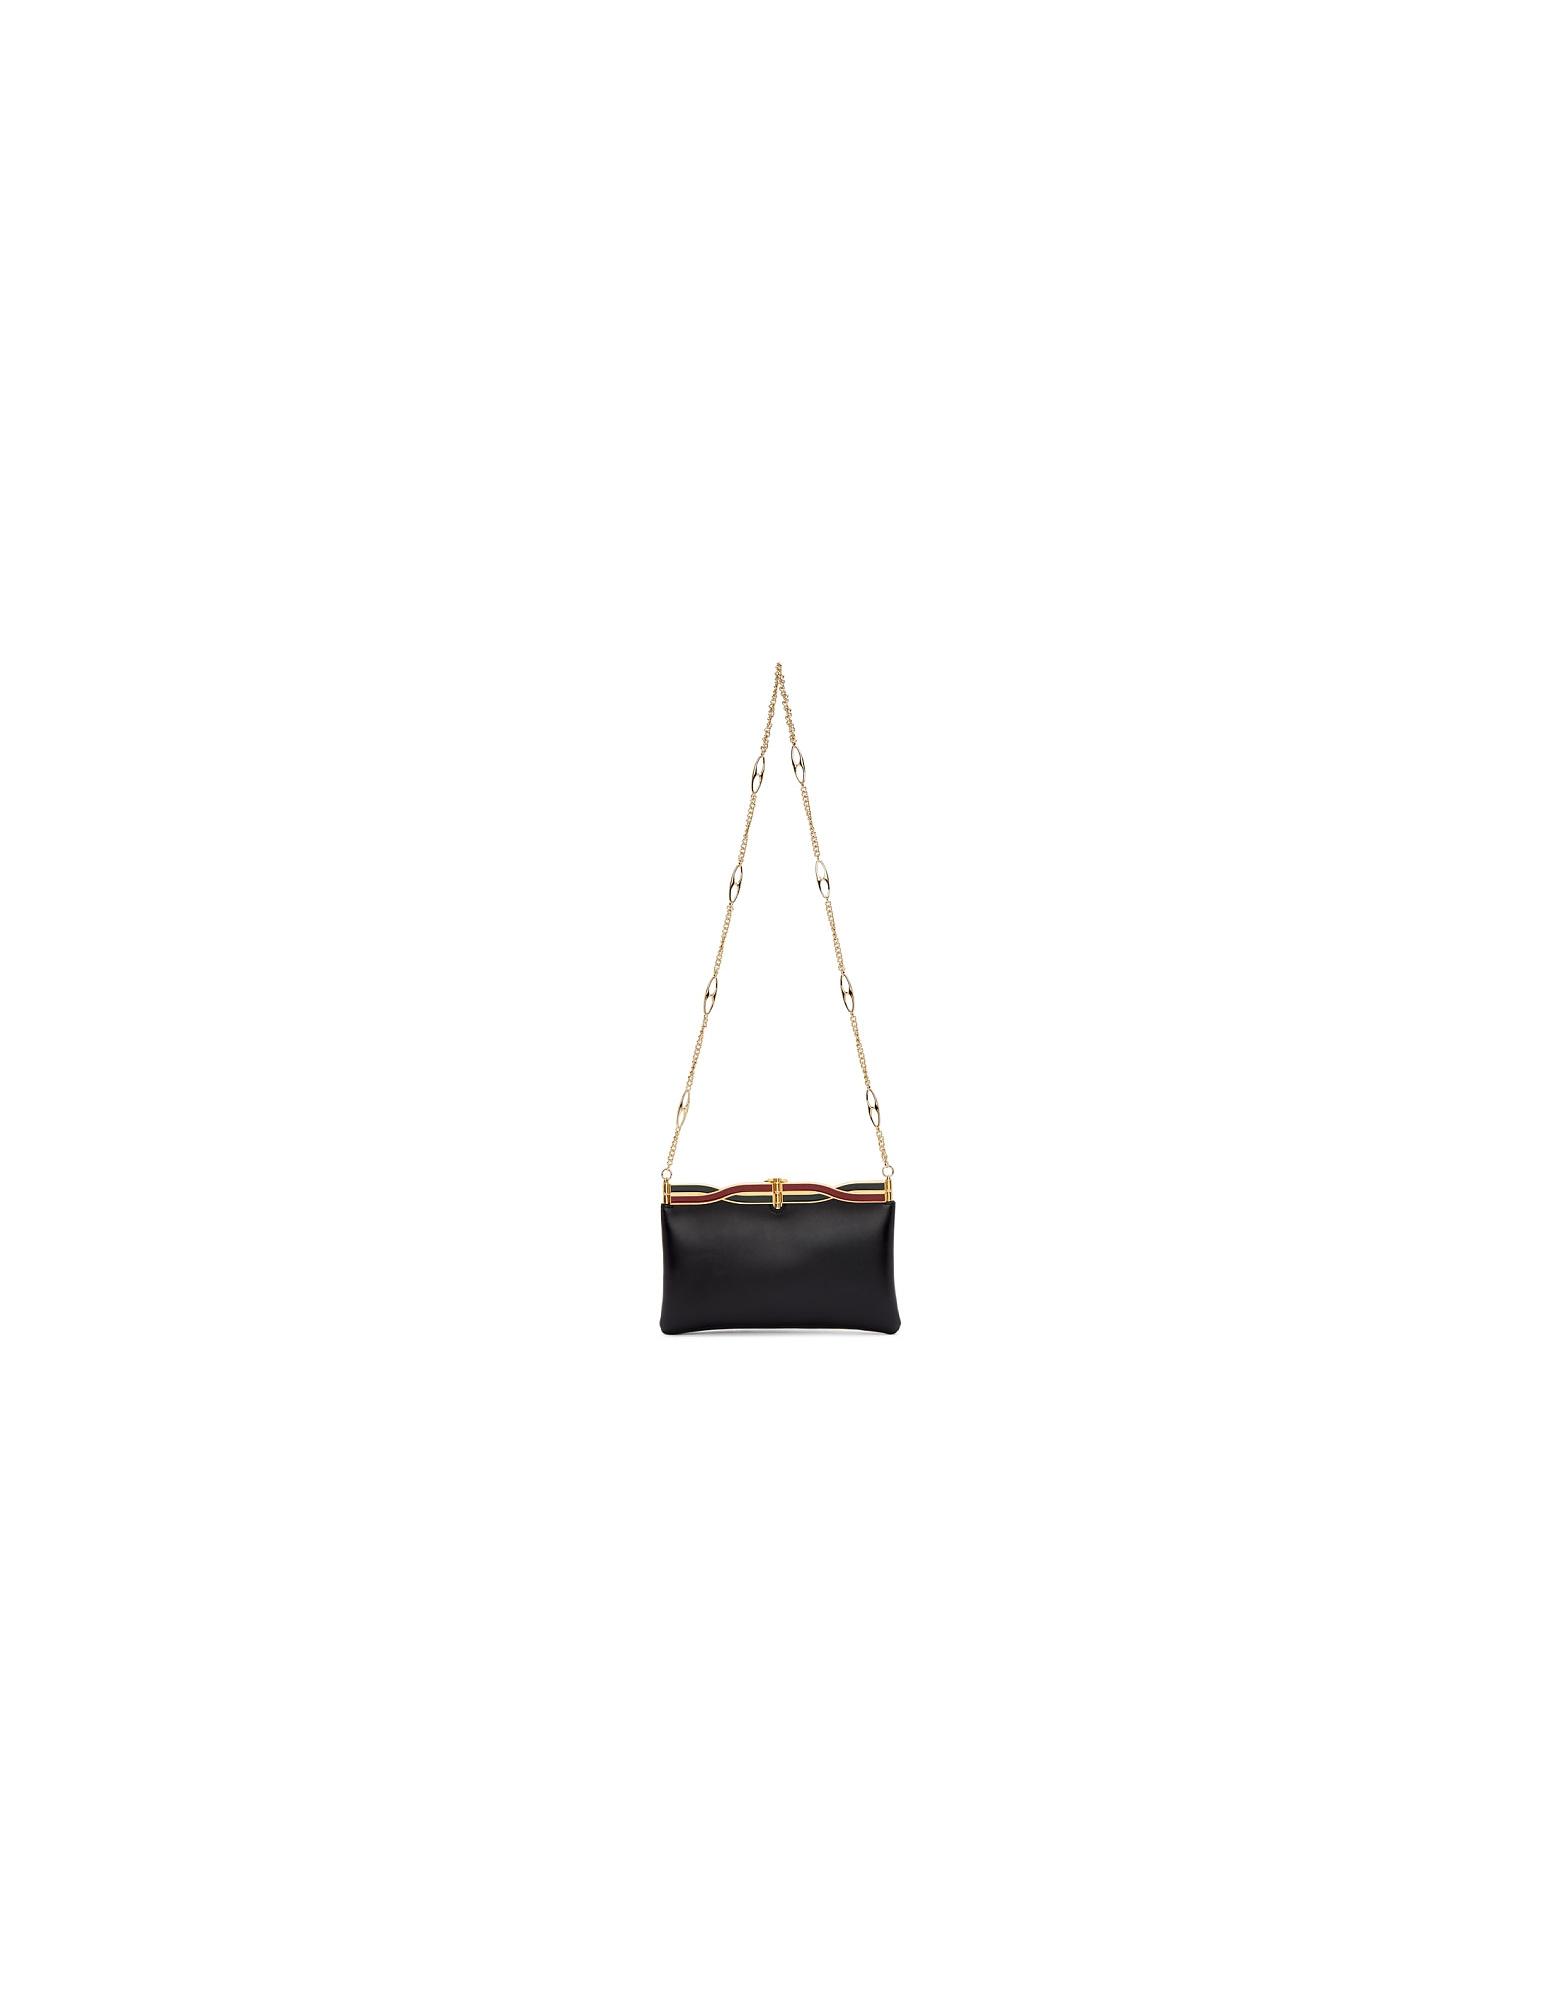 Gucci Designer Handbags, Black Broadway Evening Bag